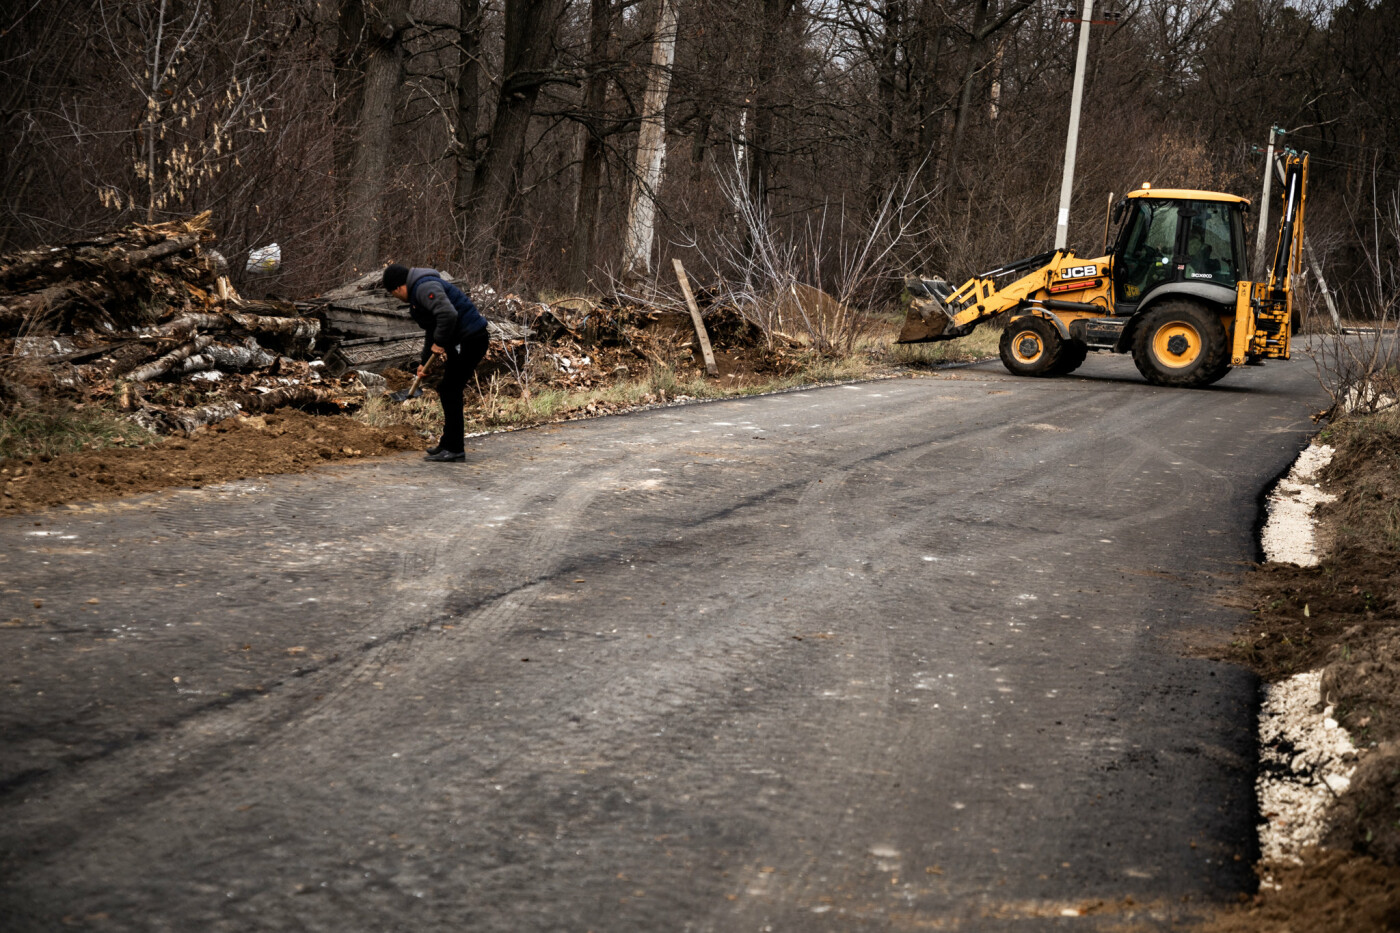 В пригороде Тамбова построили новую дорогу за 3,4 млн рублей, фото-1